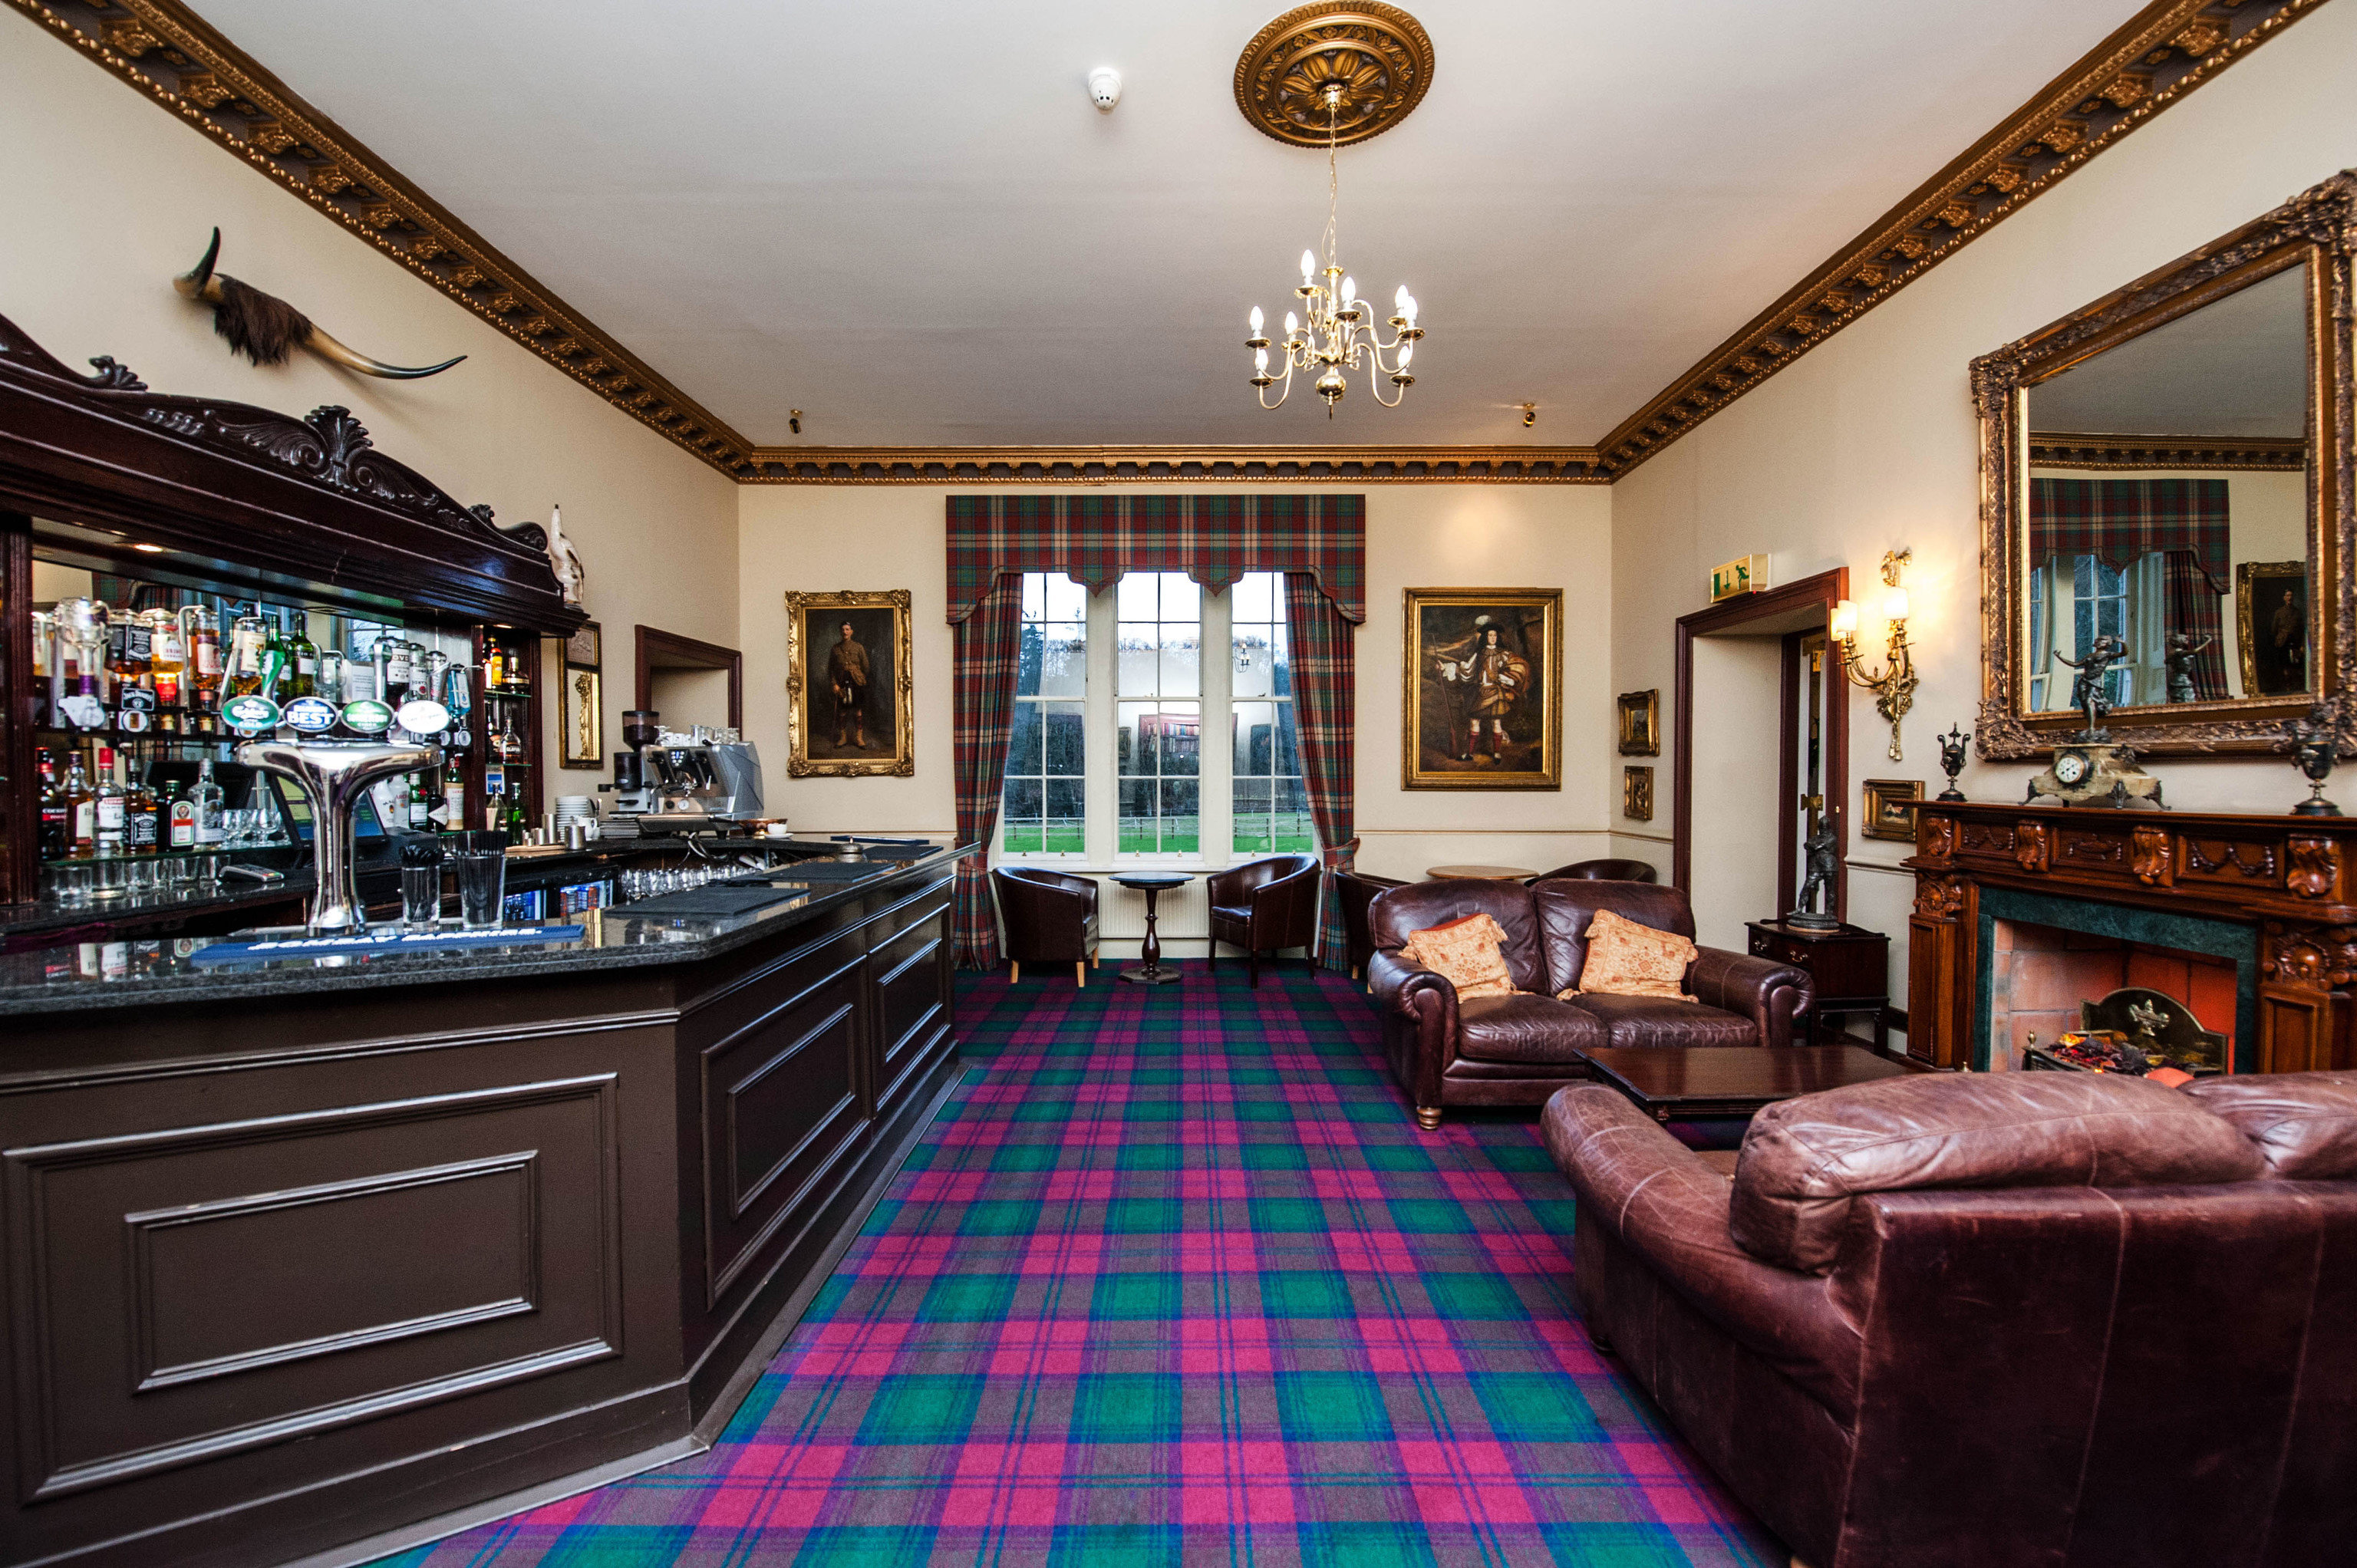 property recreation room billiard room home Lobby living room mansion Resort